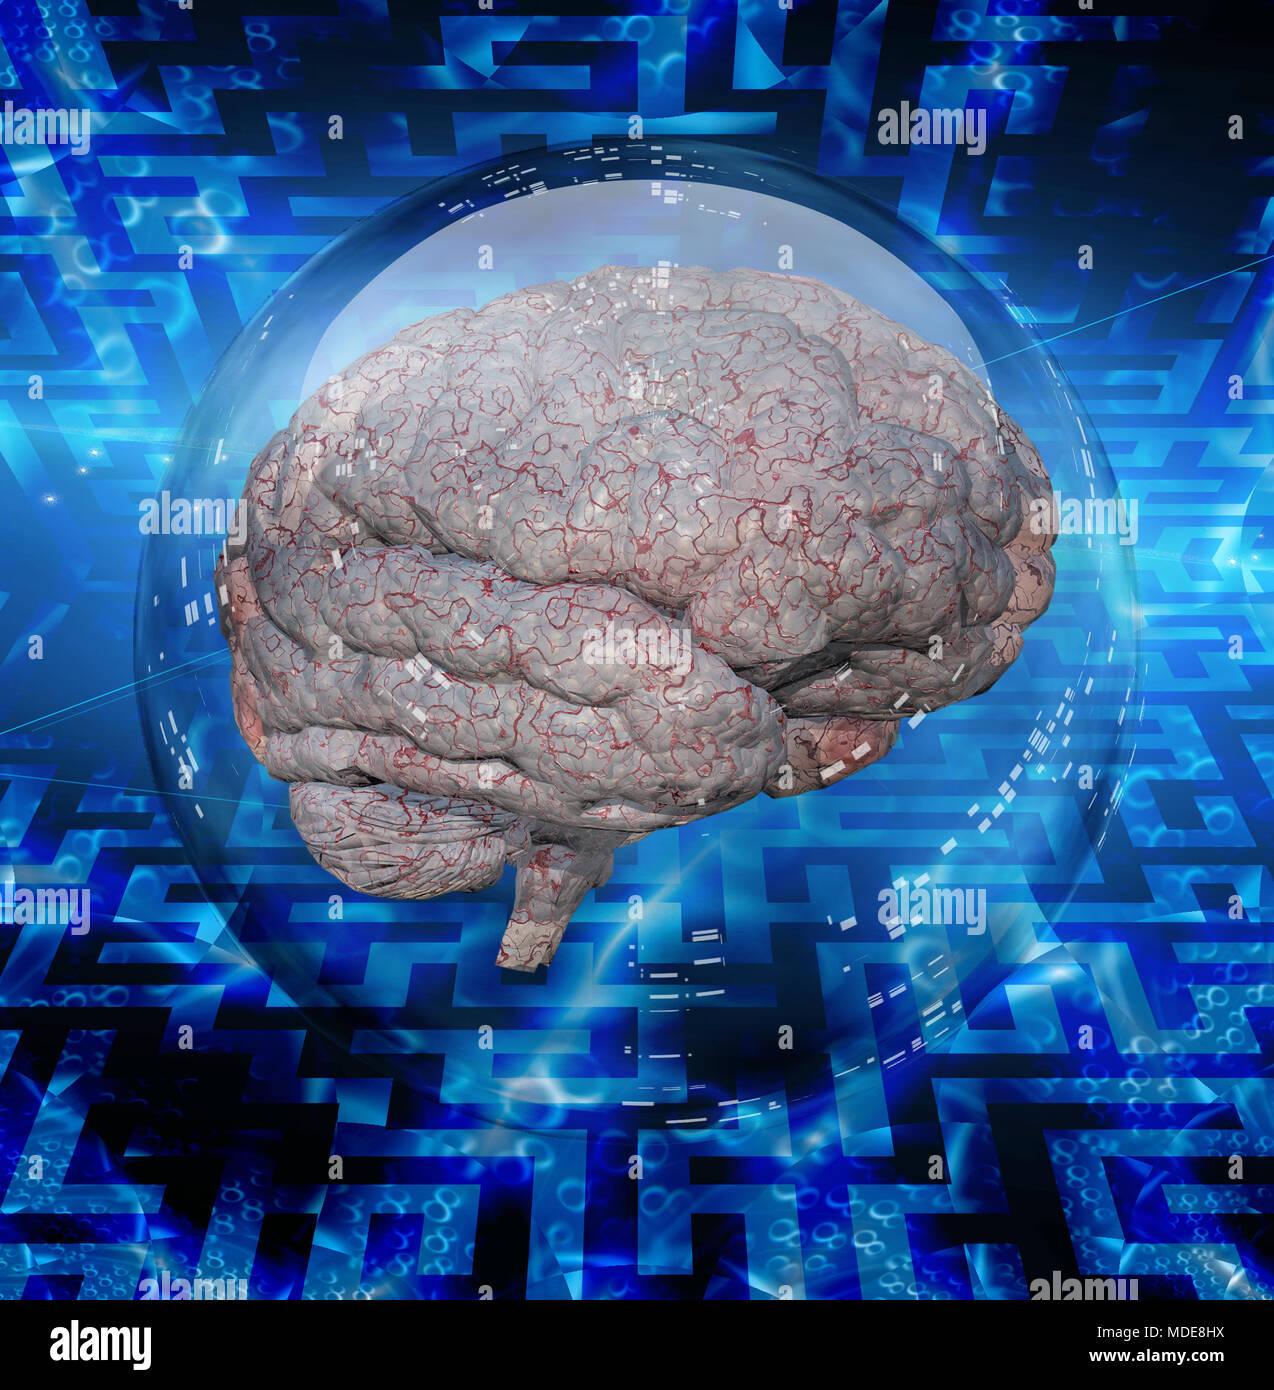 Human brain in glass sphere - Stock Image